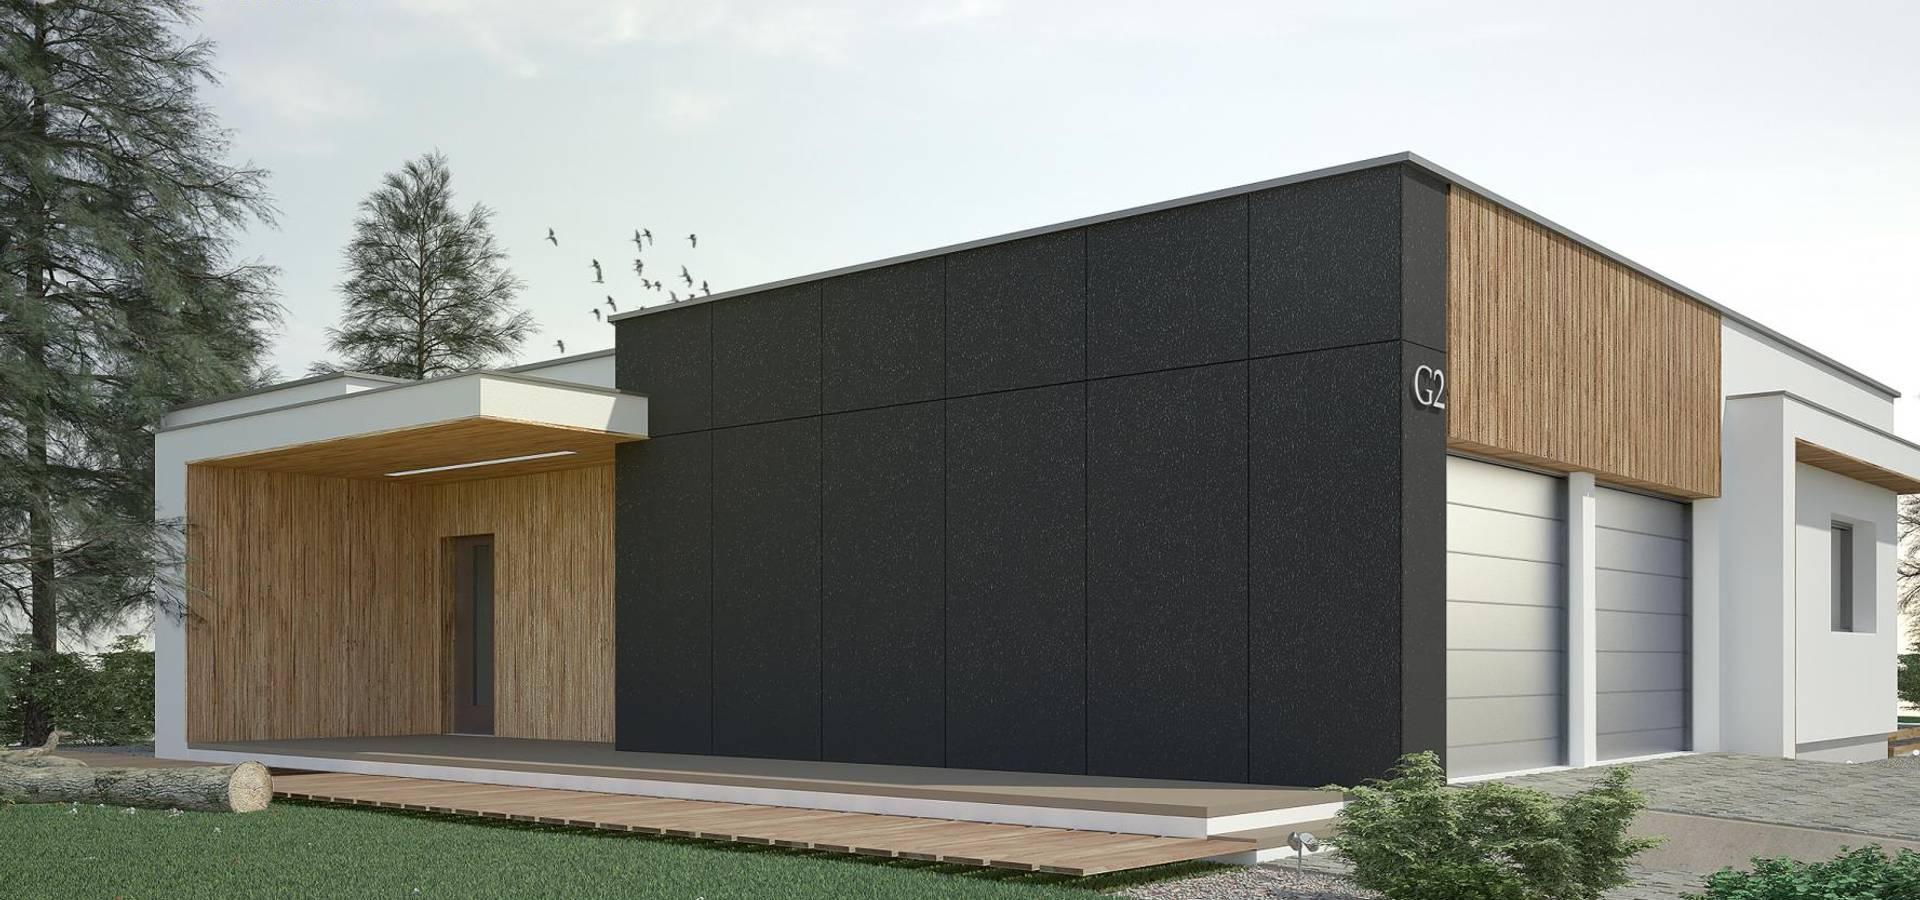 DUDA Architektura Budownictwo